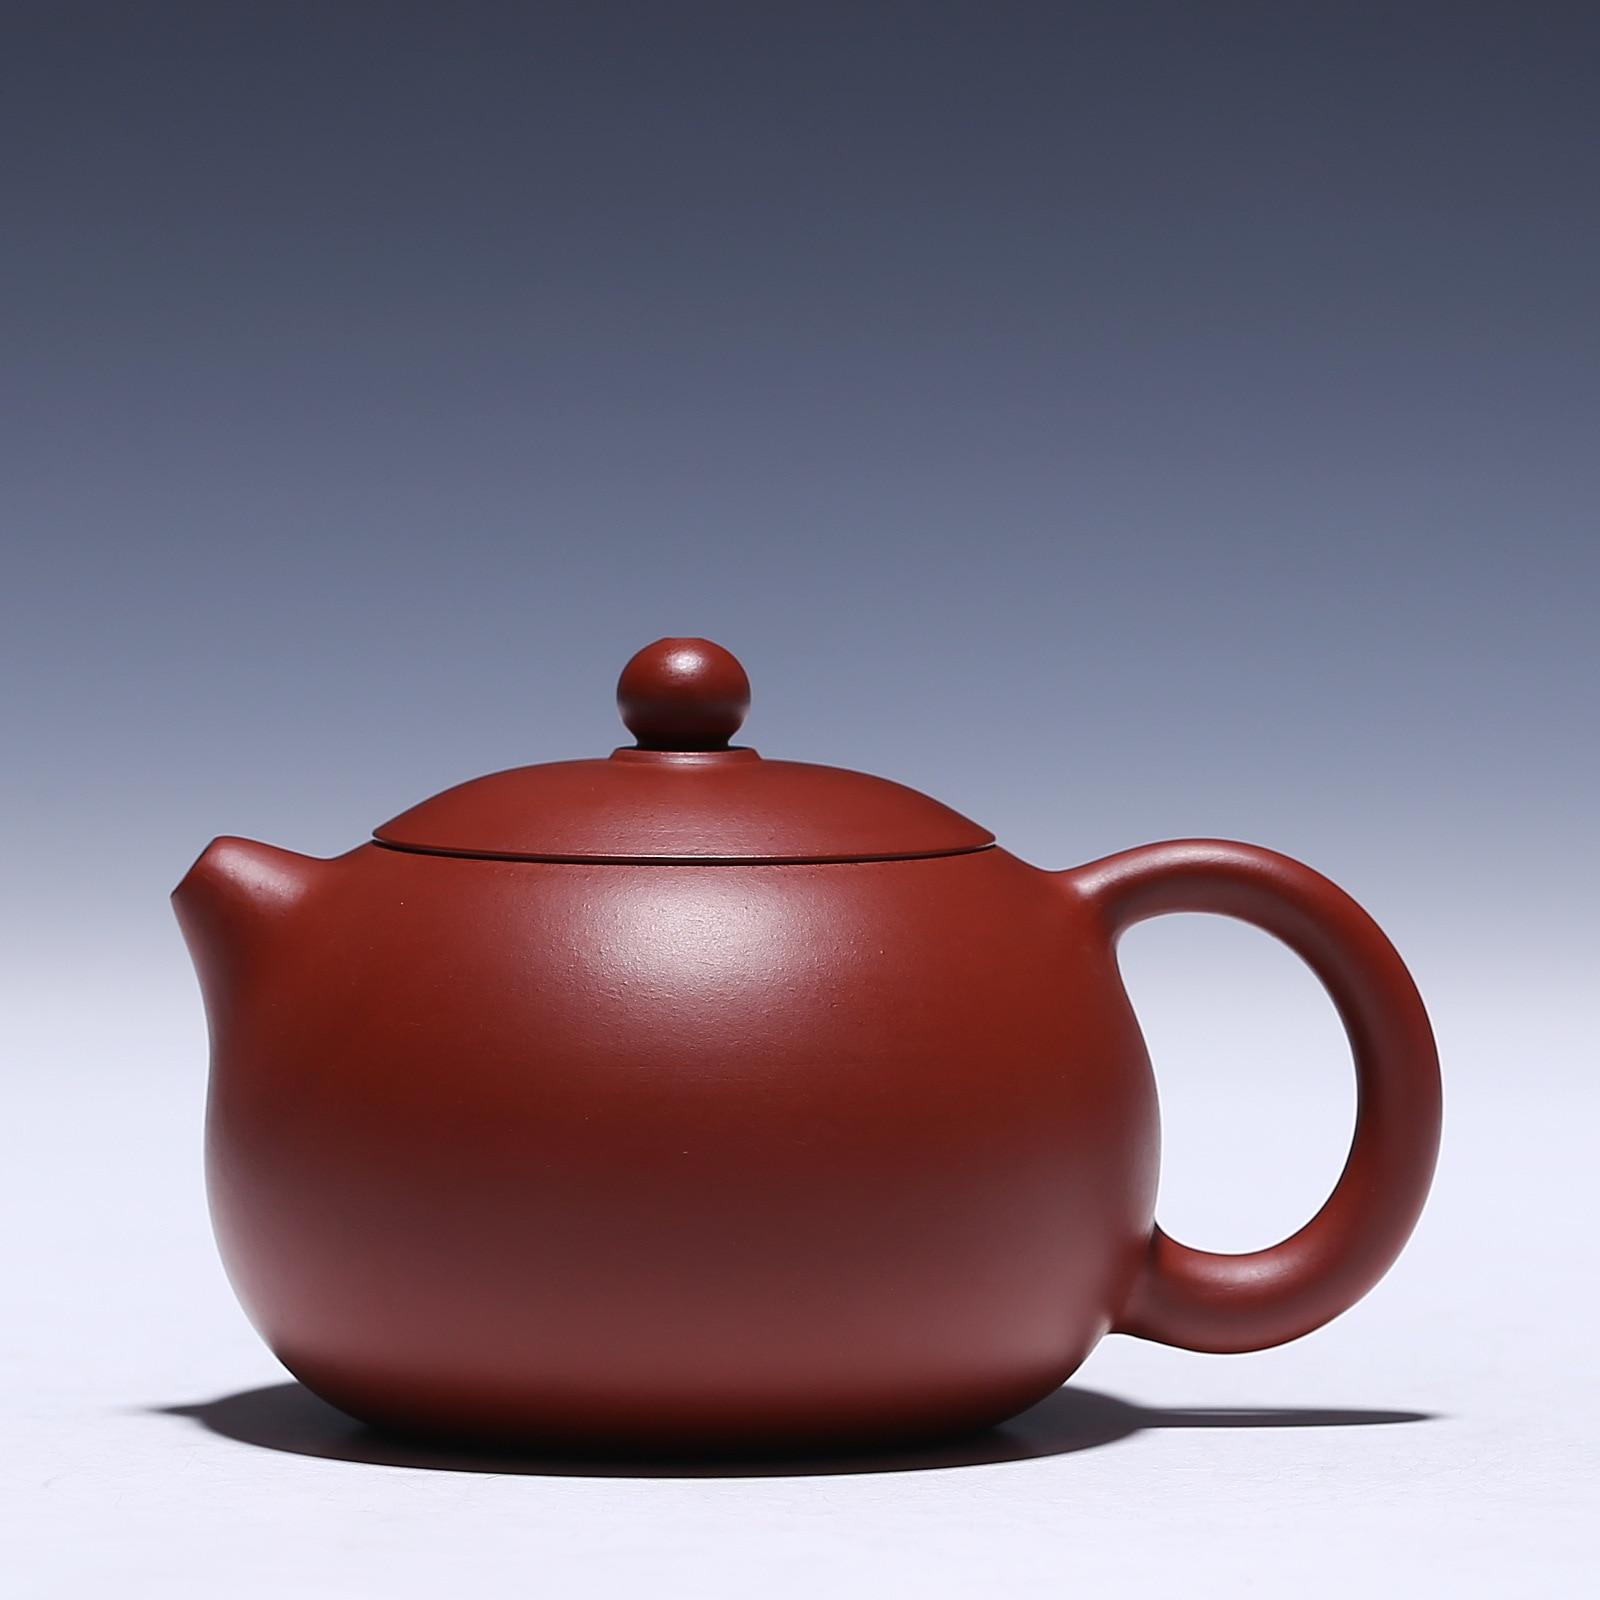 Yixing teapot pot  220cc ore red clay pot ball hole outlet Dahongpao beauty 2233Yixing teapot pot  220cc ore red clay pot ball hole outlet Dahongpao beauty 2233